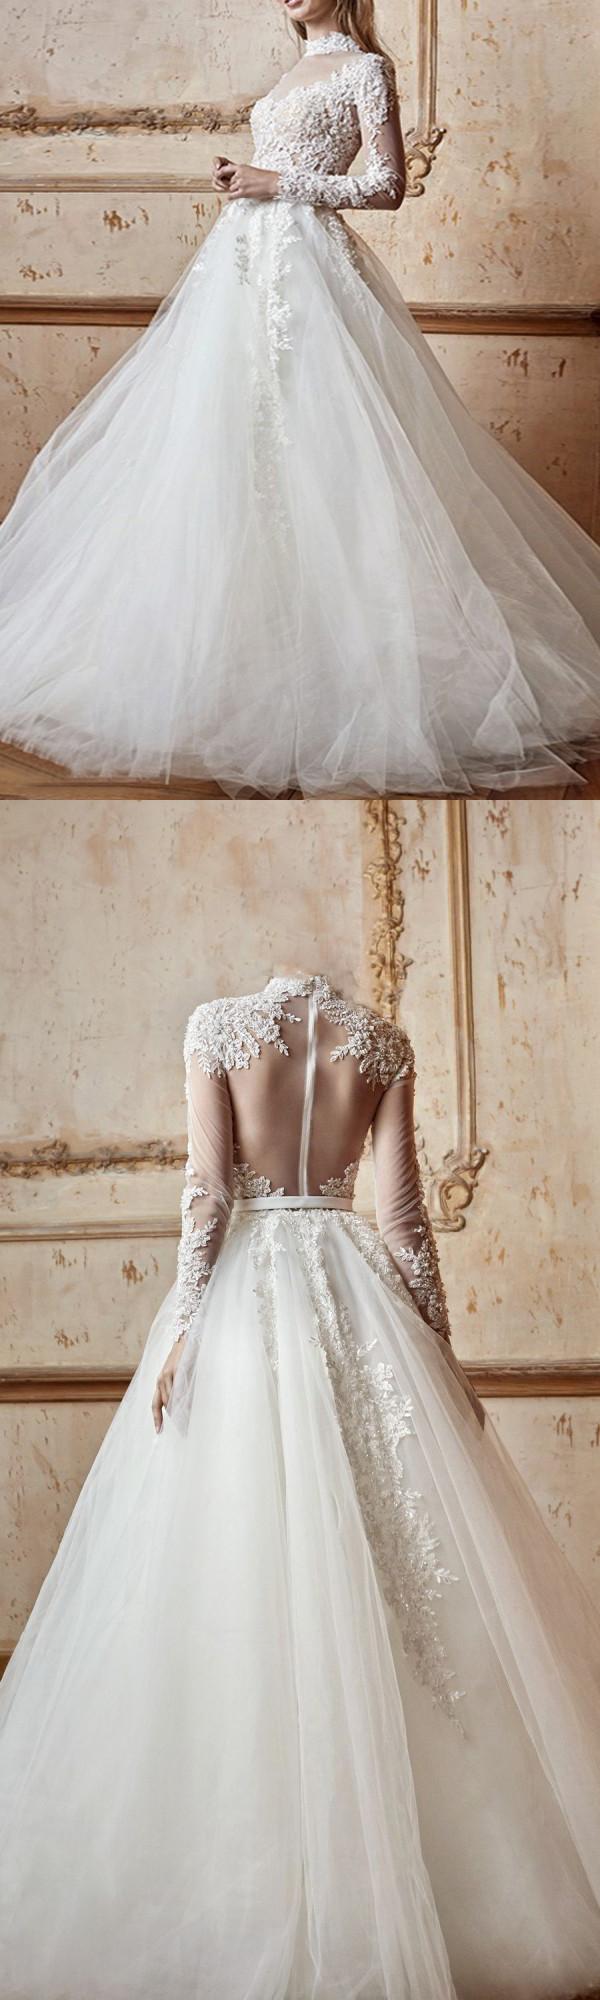 Aline high neck floorlength long sleeve tulle wedding dress